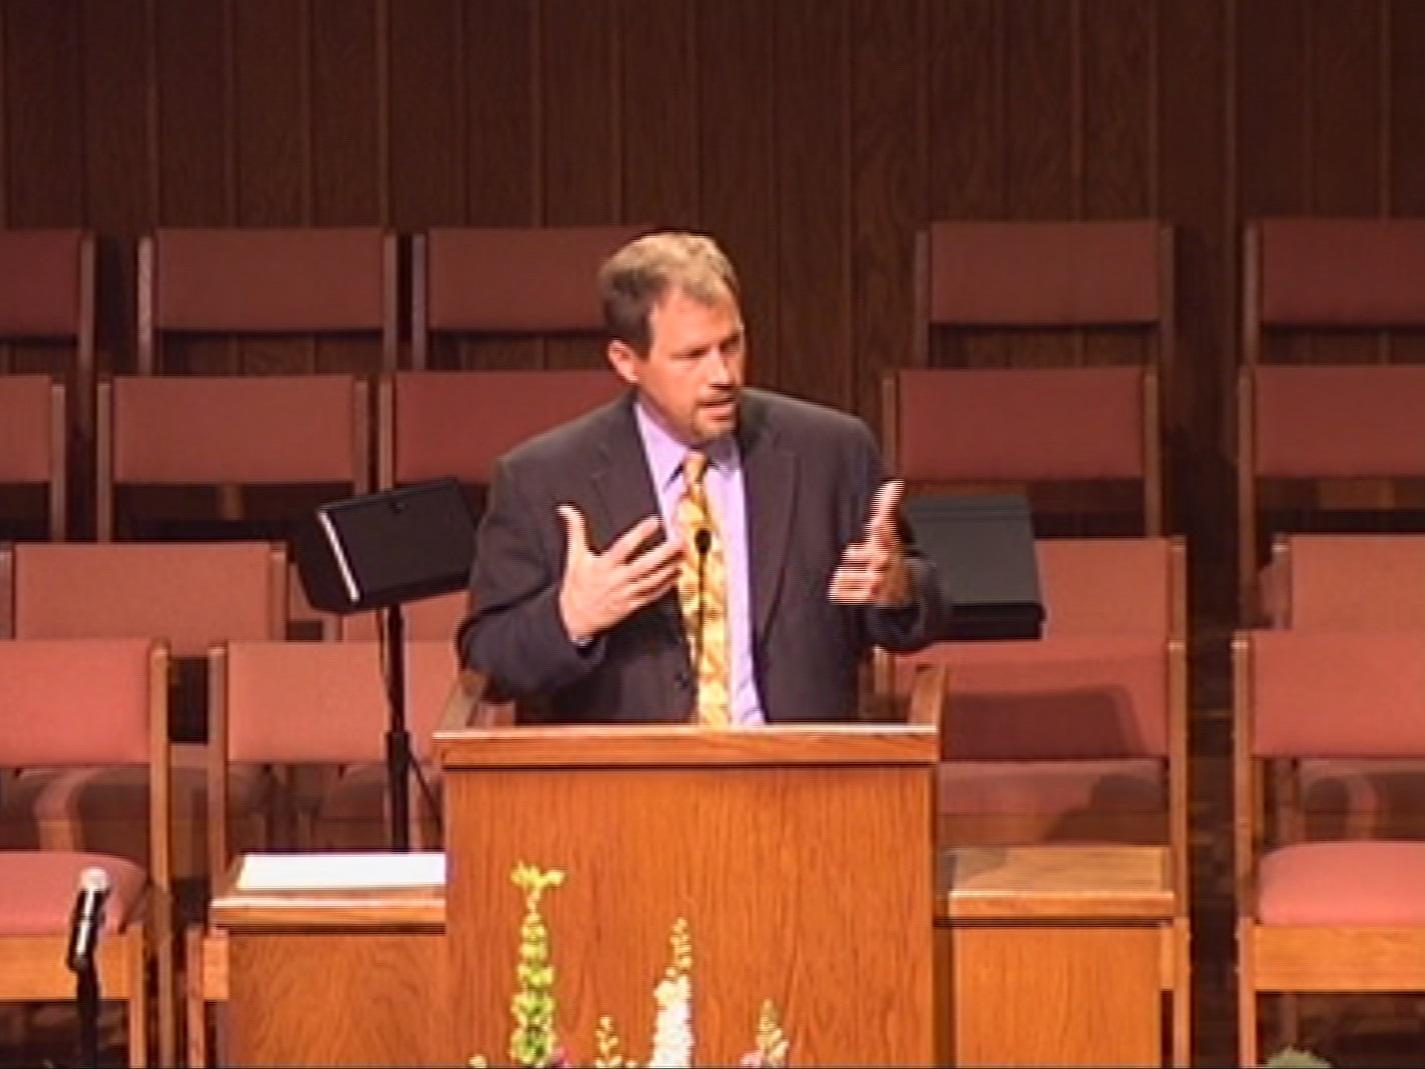 Sermon (video): The Motivating Power of God's Forgiveness